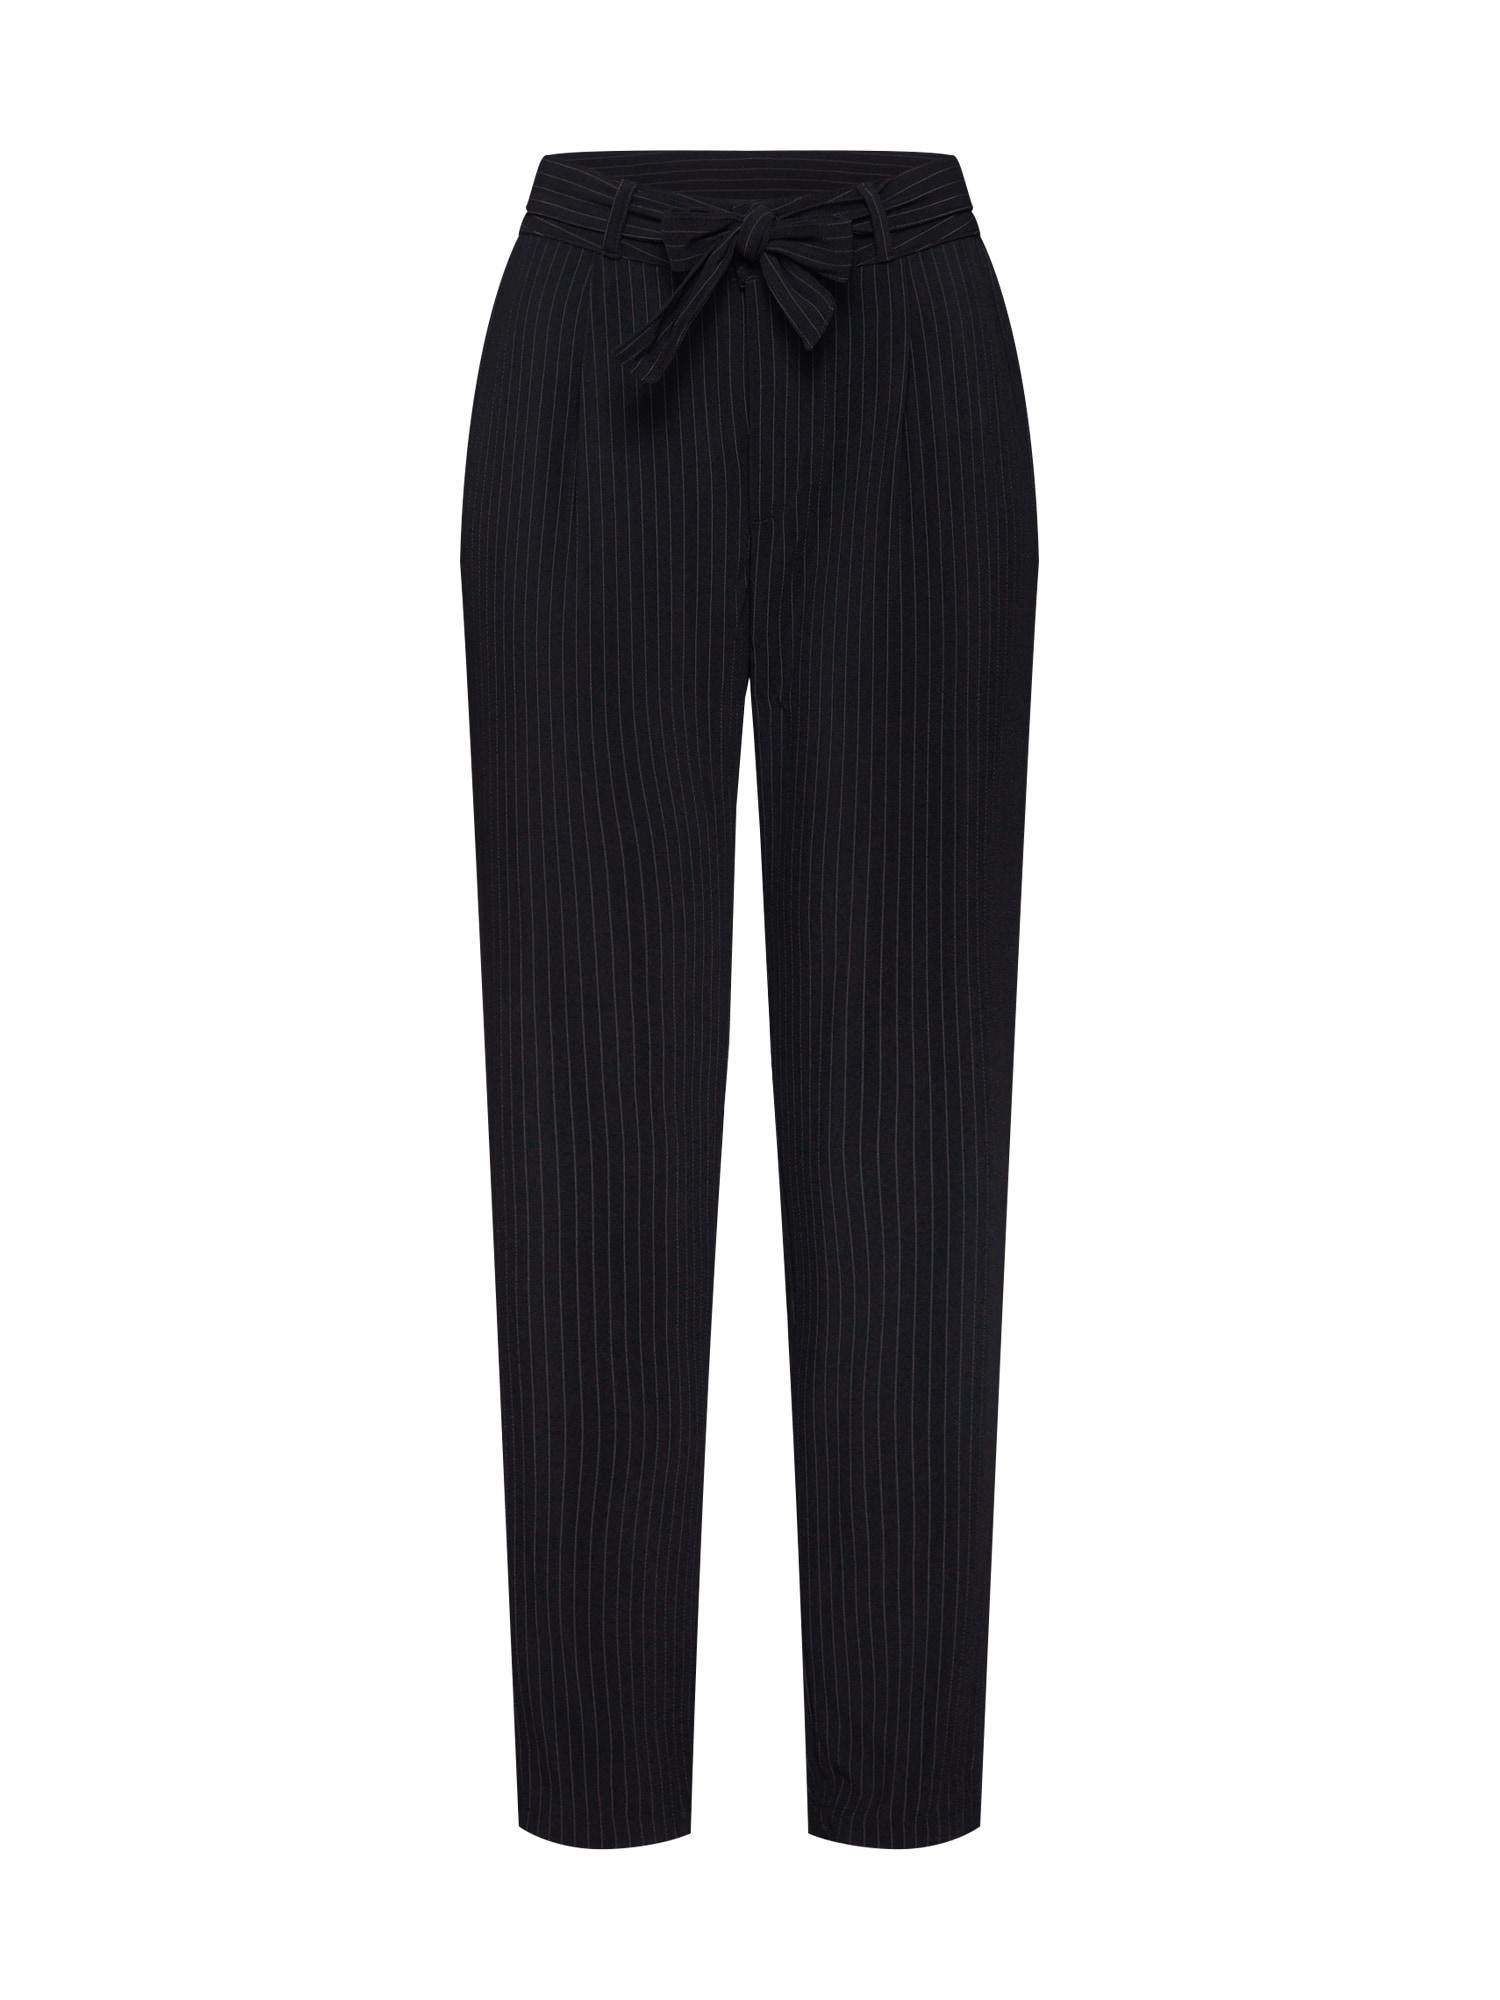 JACQUELINE de YONG Chino stiliaus kelnės 'JDYOMA BELT PANT WVN' juoda / balta